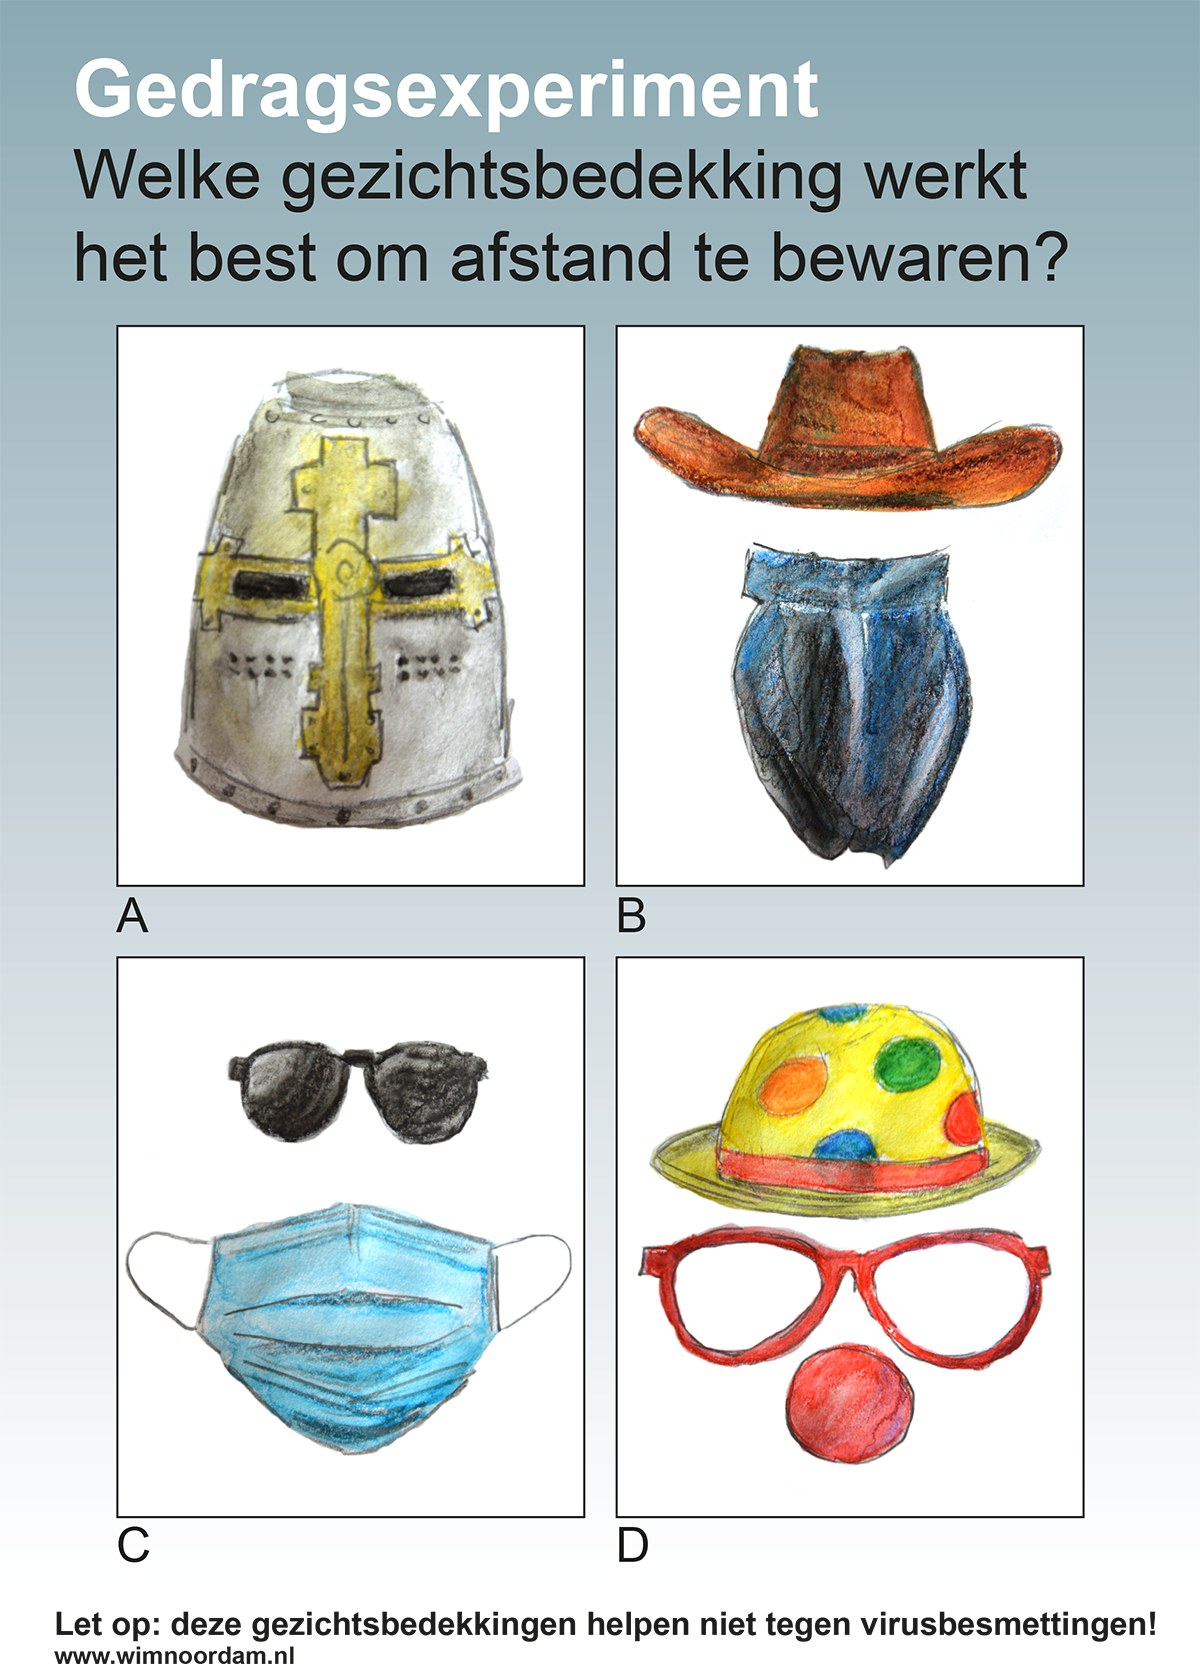 Gedragsexperiment, Wim Noordam